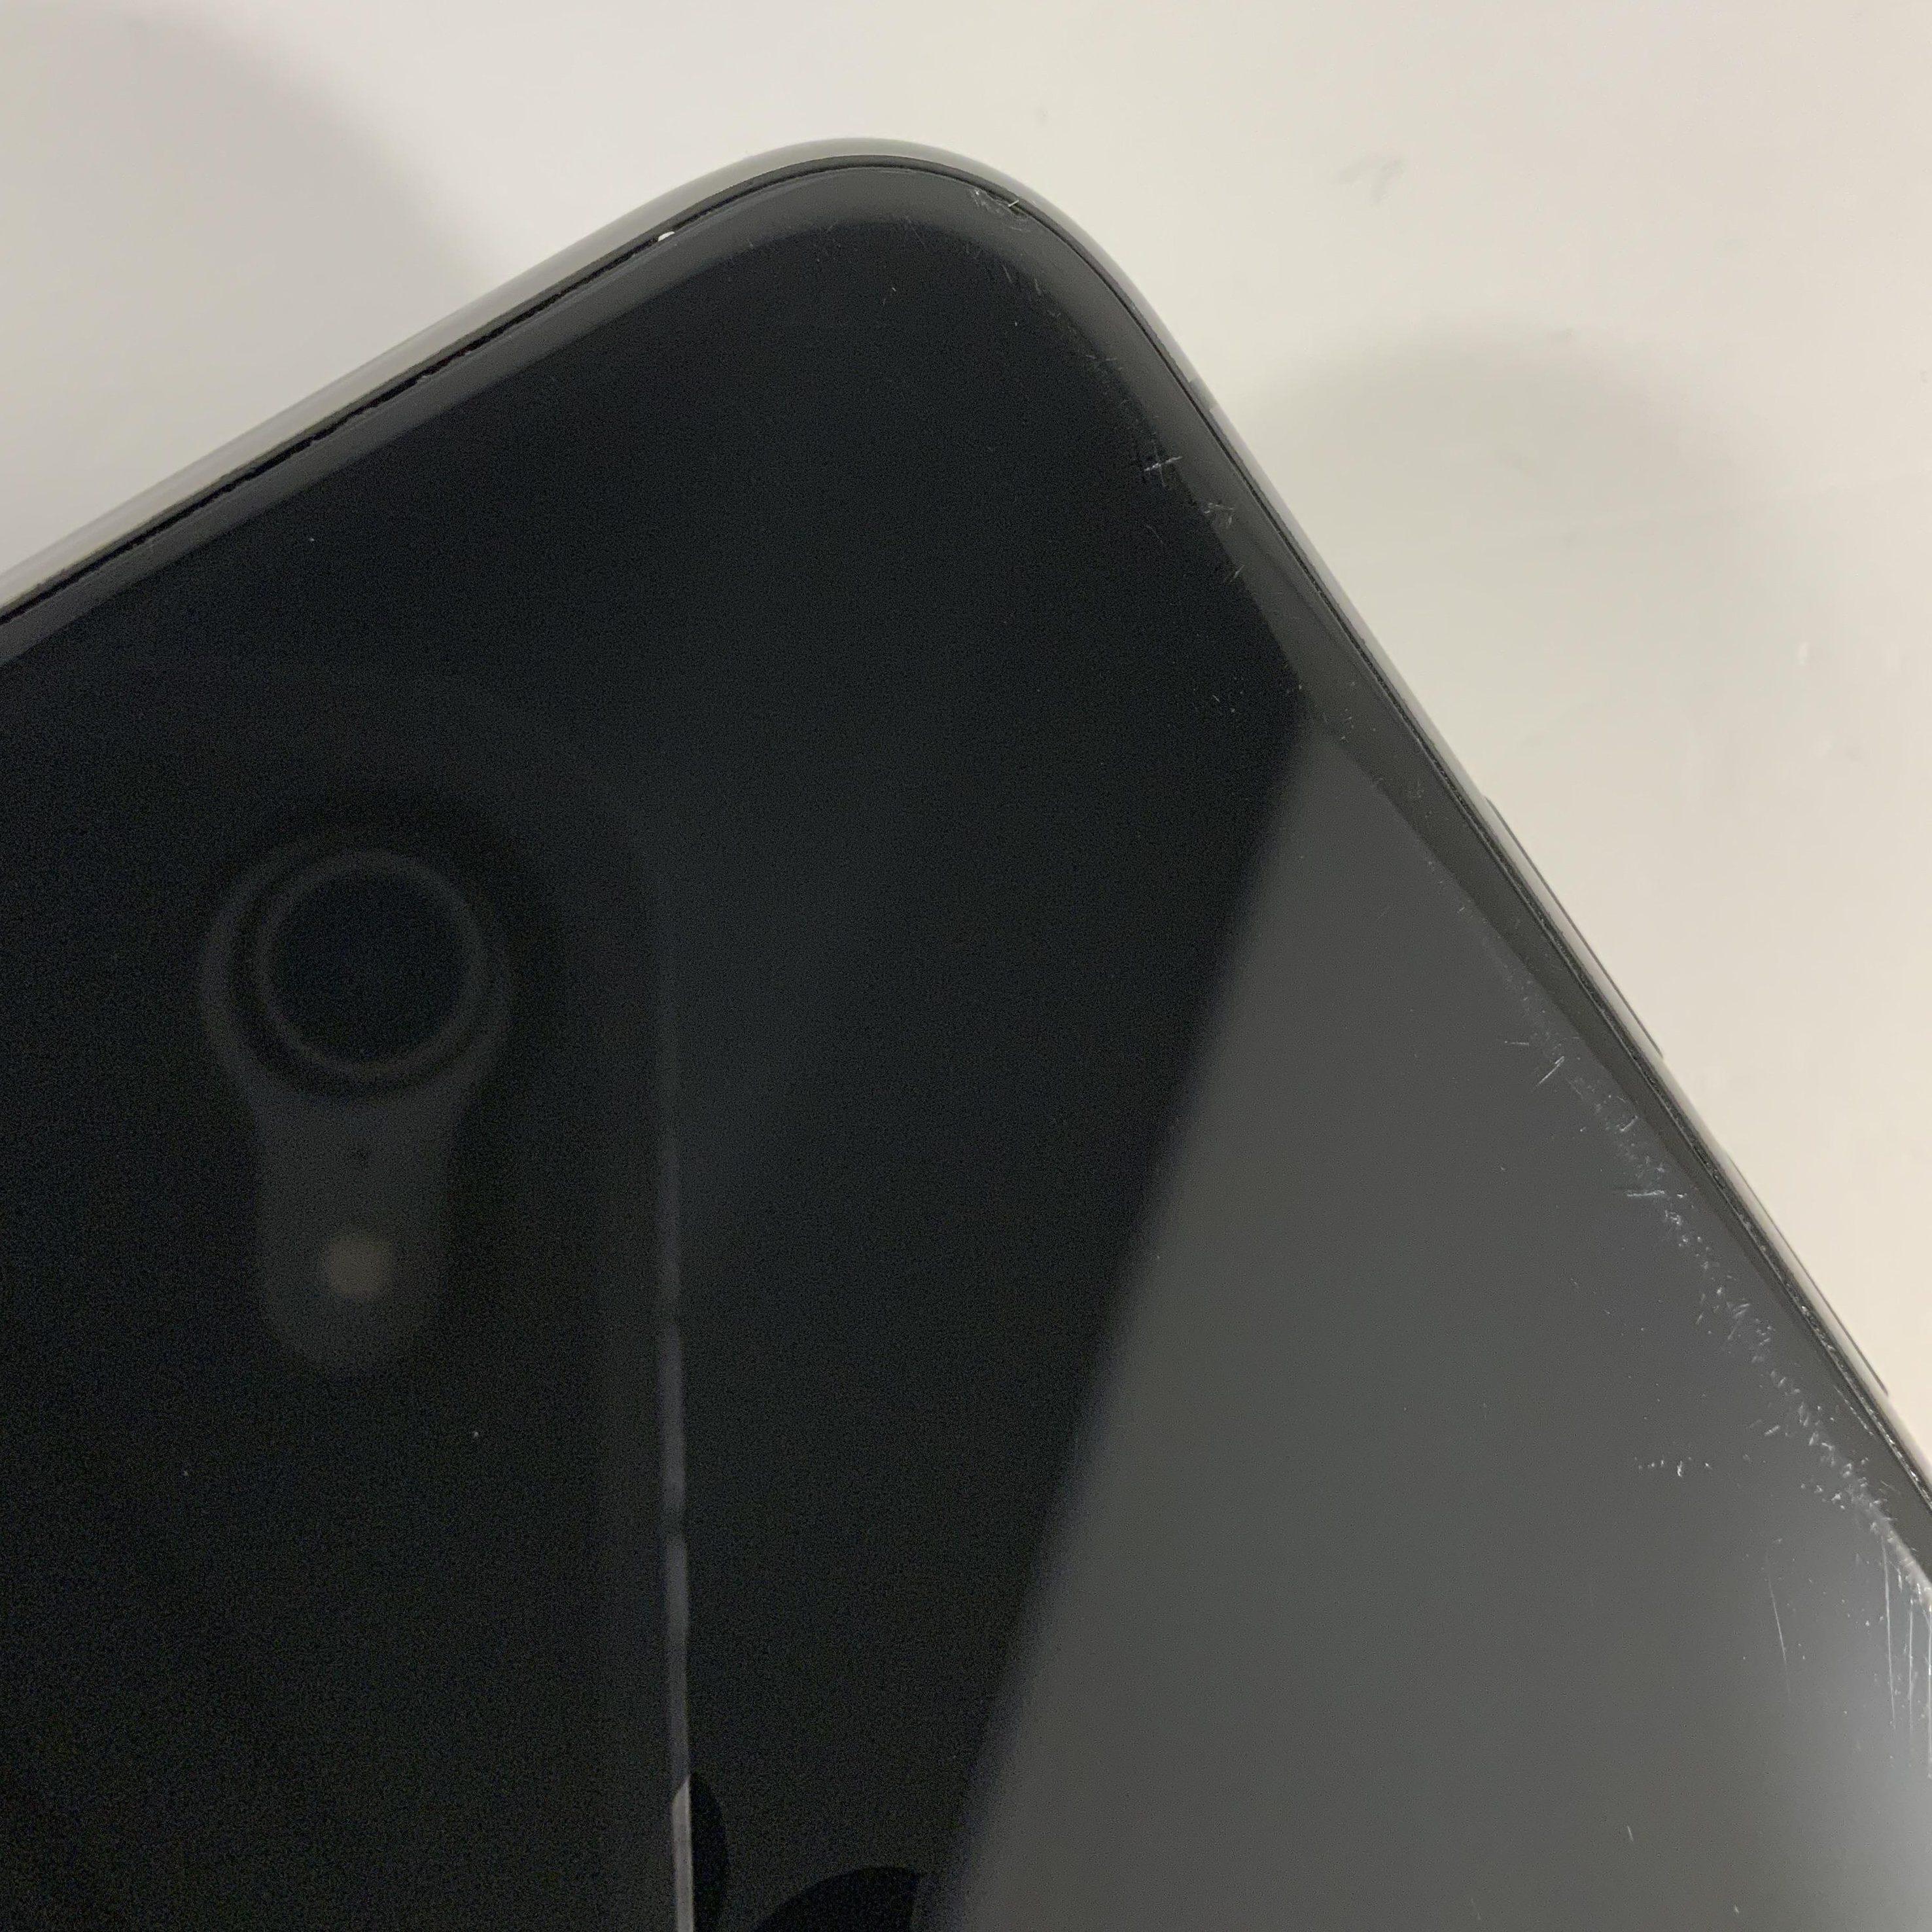 iPhone XS Max 64GB, 64GB, Space Gray, obraz 4